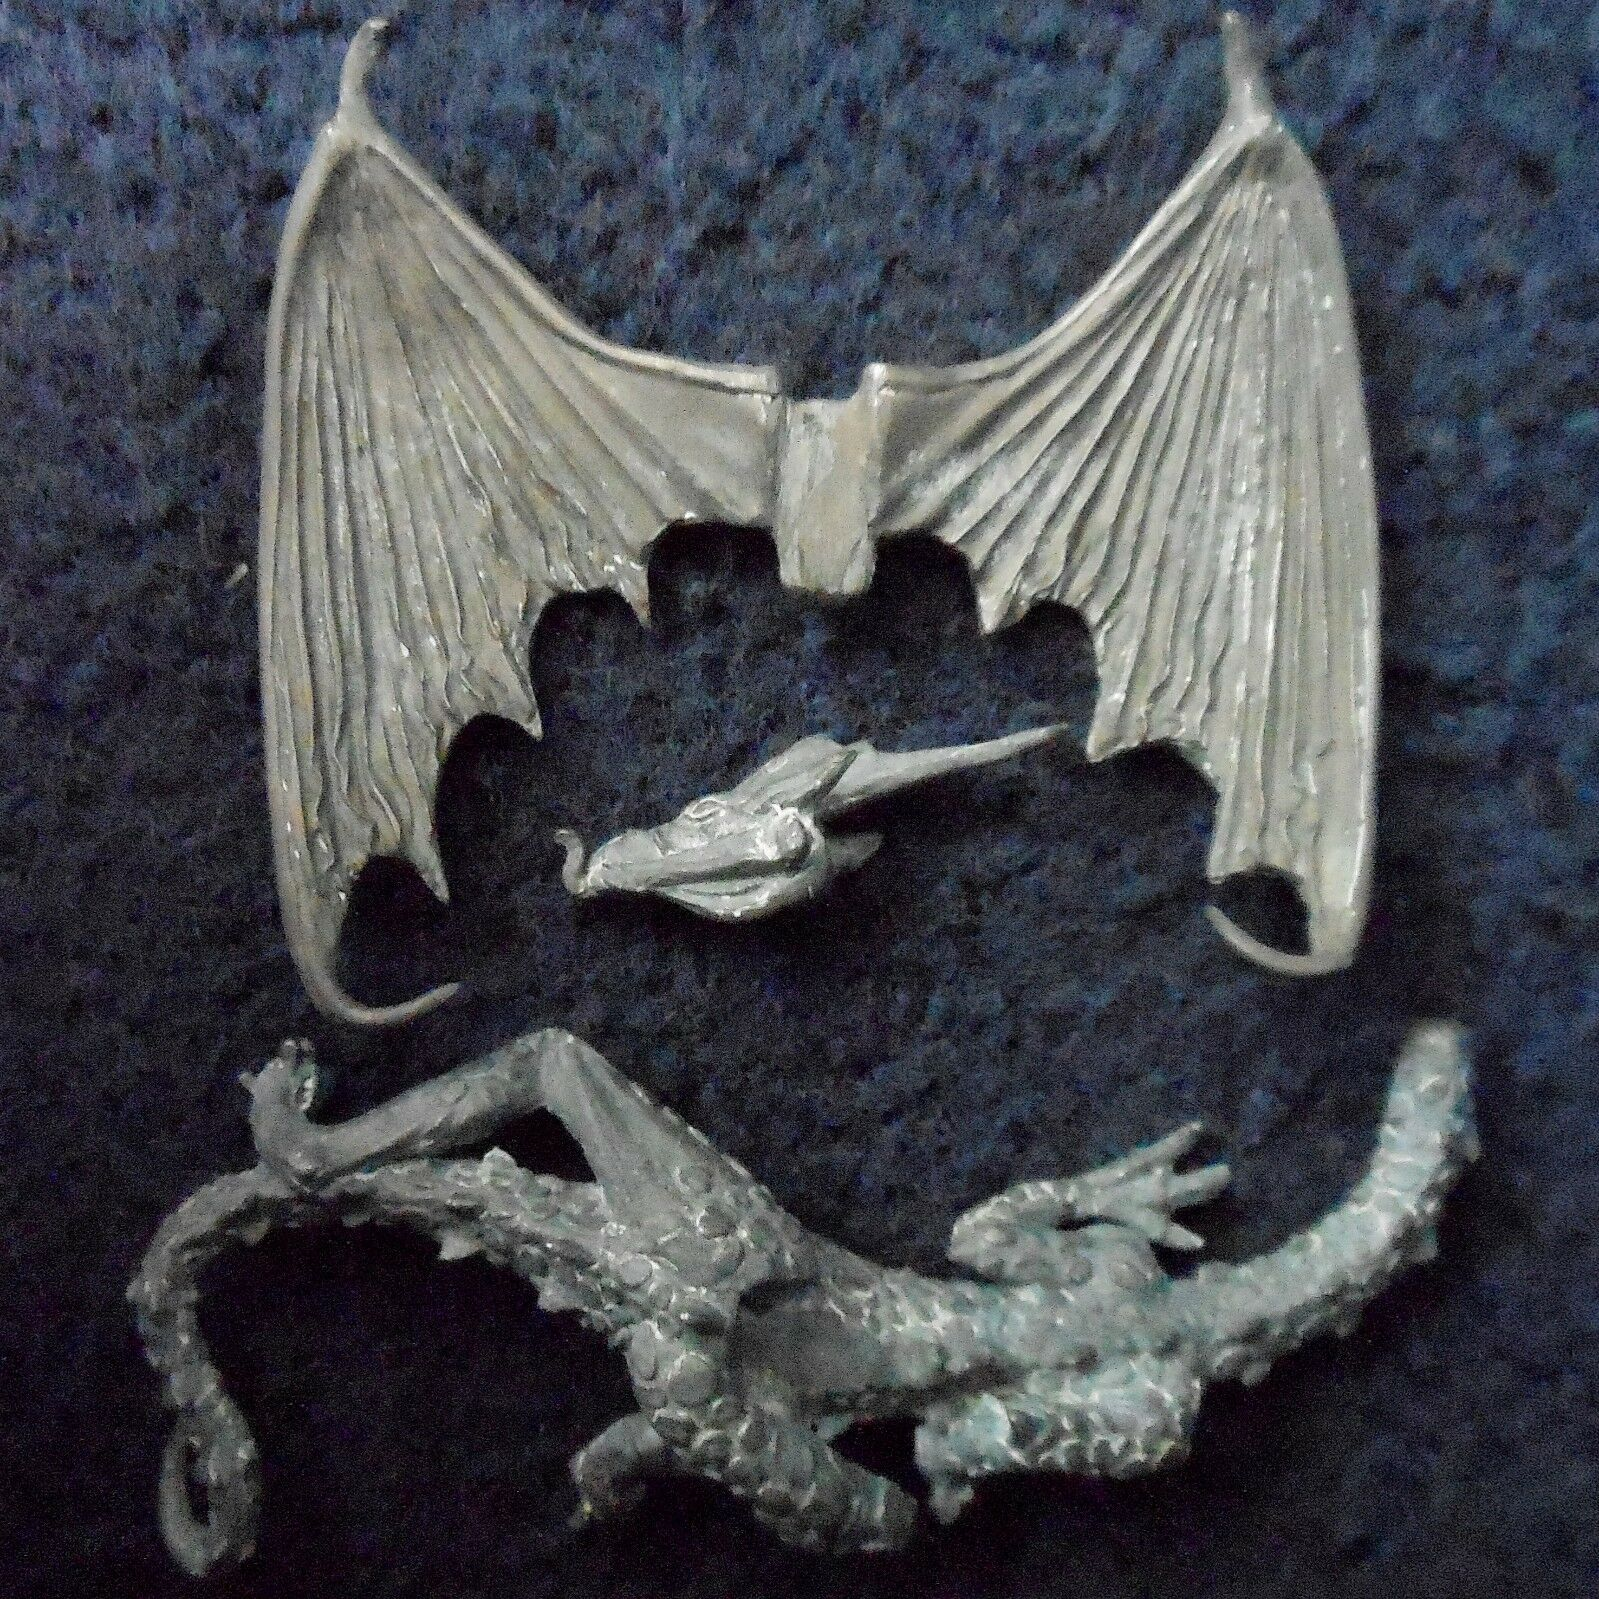 1983 C11 DRG3 Ice H5 Dungeons & Dragons Games Workshop Citadel Fantasy Tribes GW